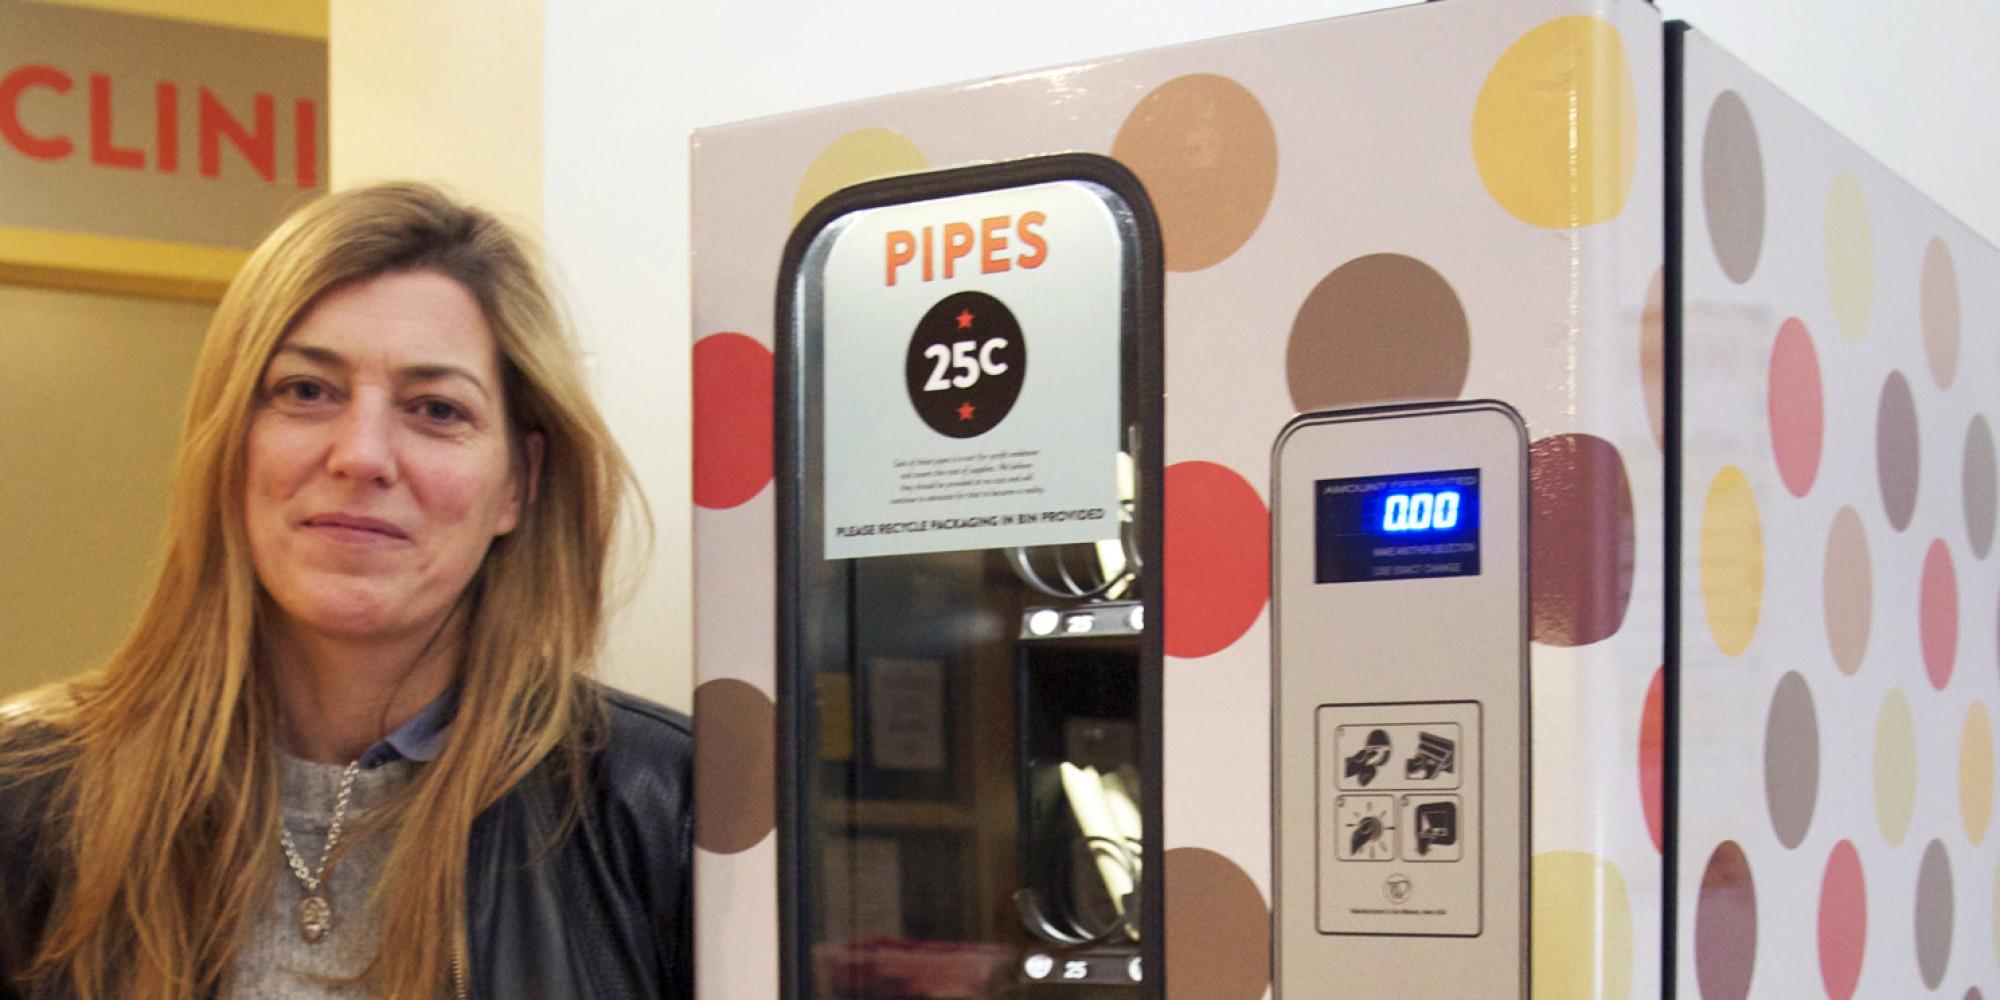 pipe vending machine